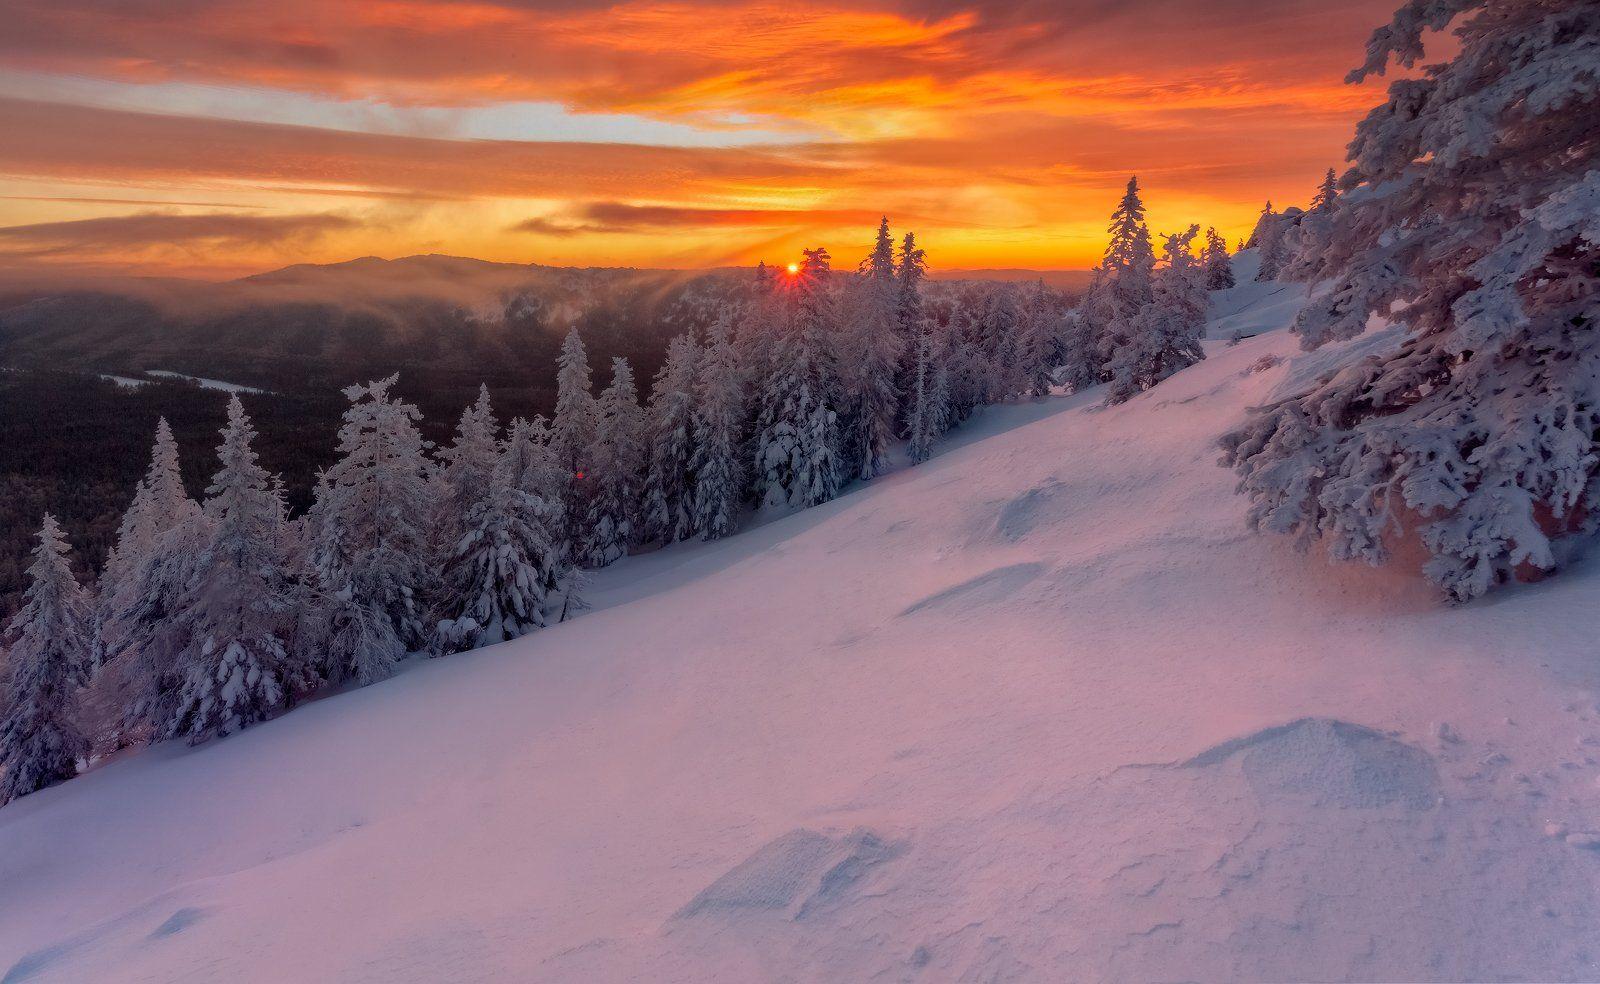 таганай, рассвет, зима, златоуст, урал,  t_berg, Михаил Трахтенберг ( t_berg )